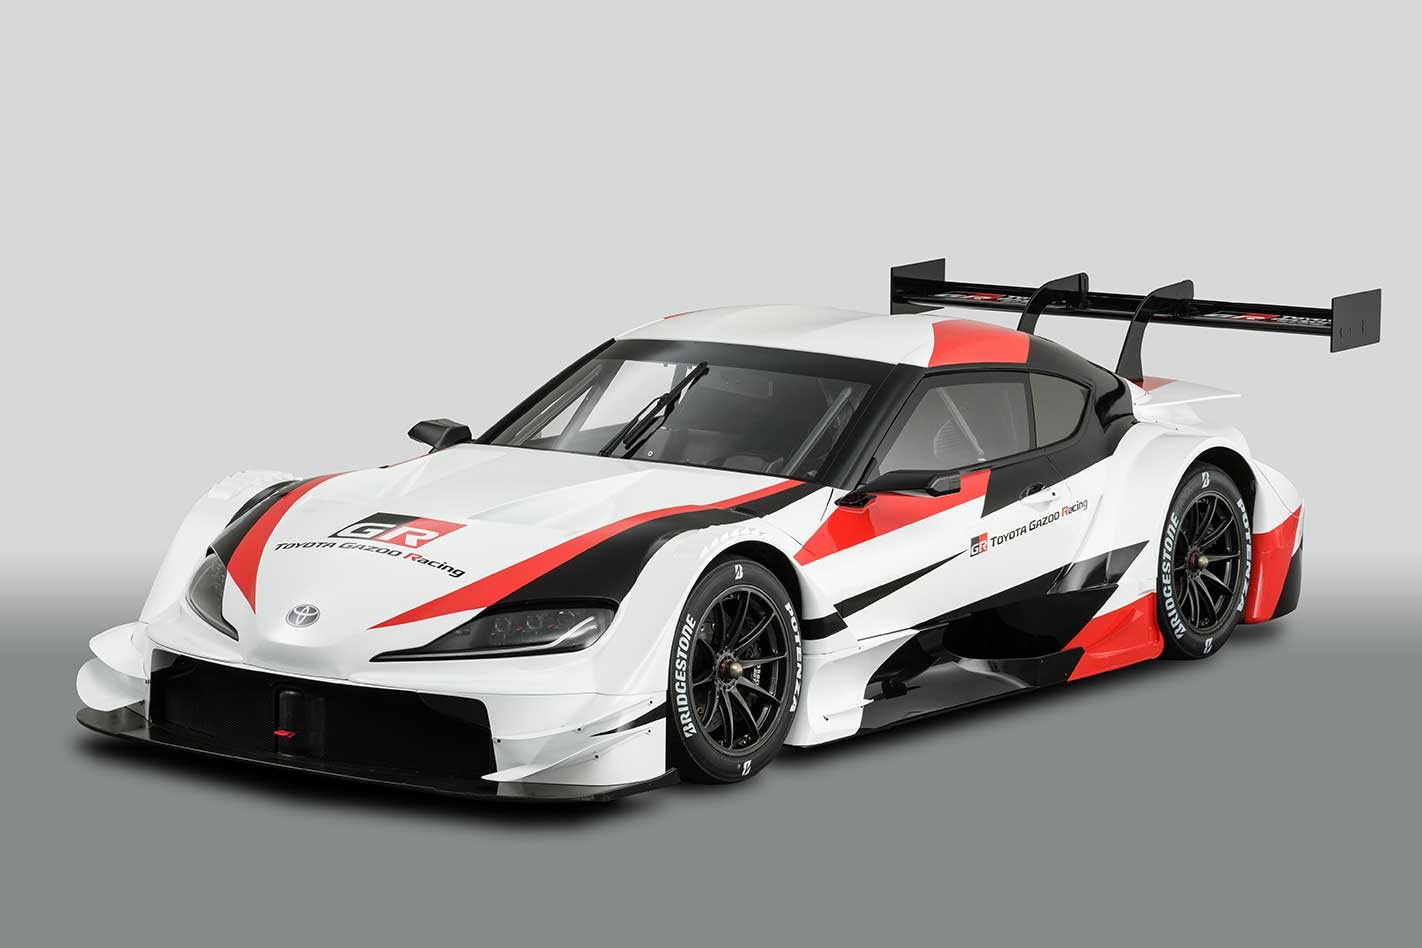 Tokyo Auto Salon 2019: Toyota Supra to join Super GT race ...